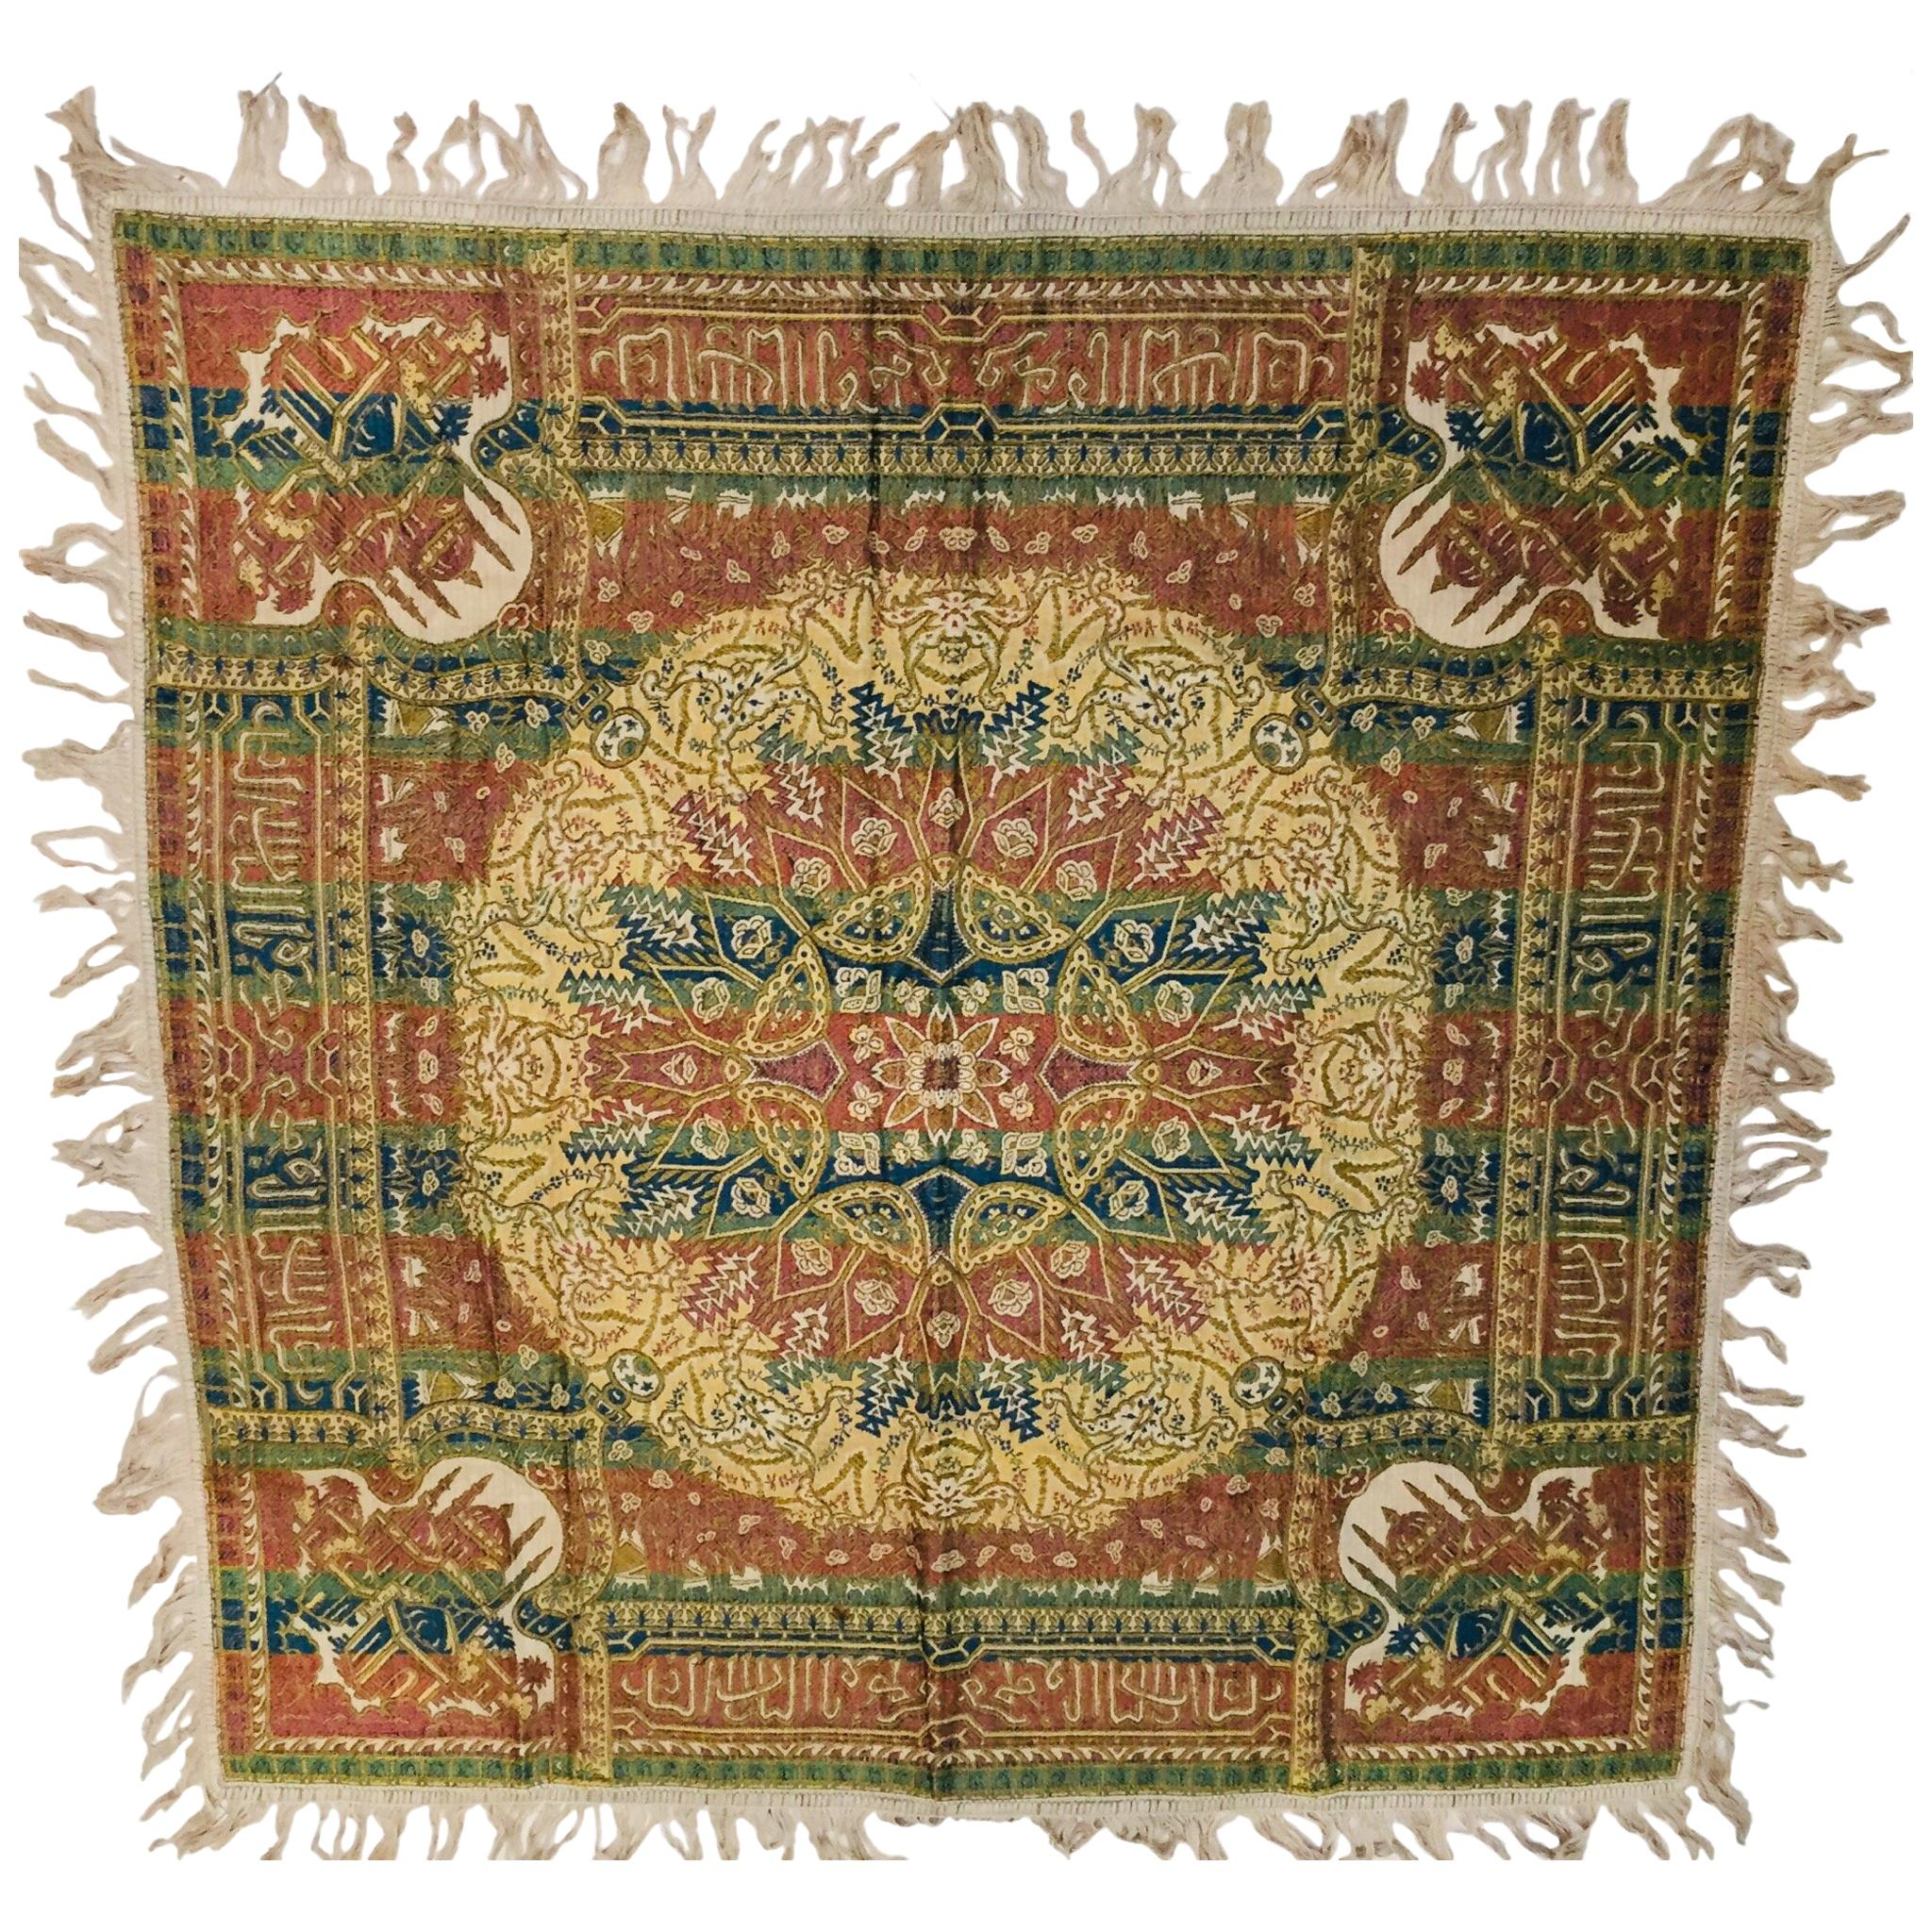 Granada Islamic Spain Textile with Arabic Calligraphy Writing